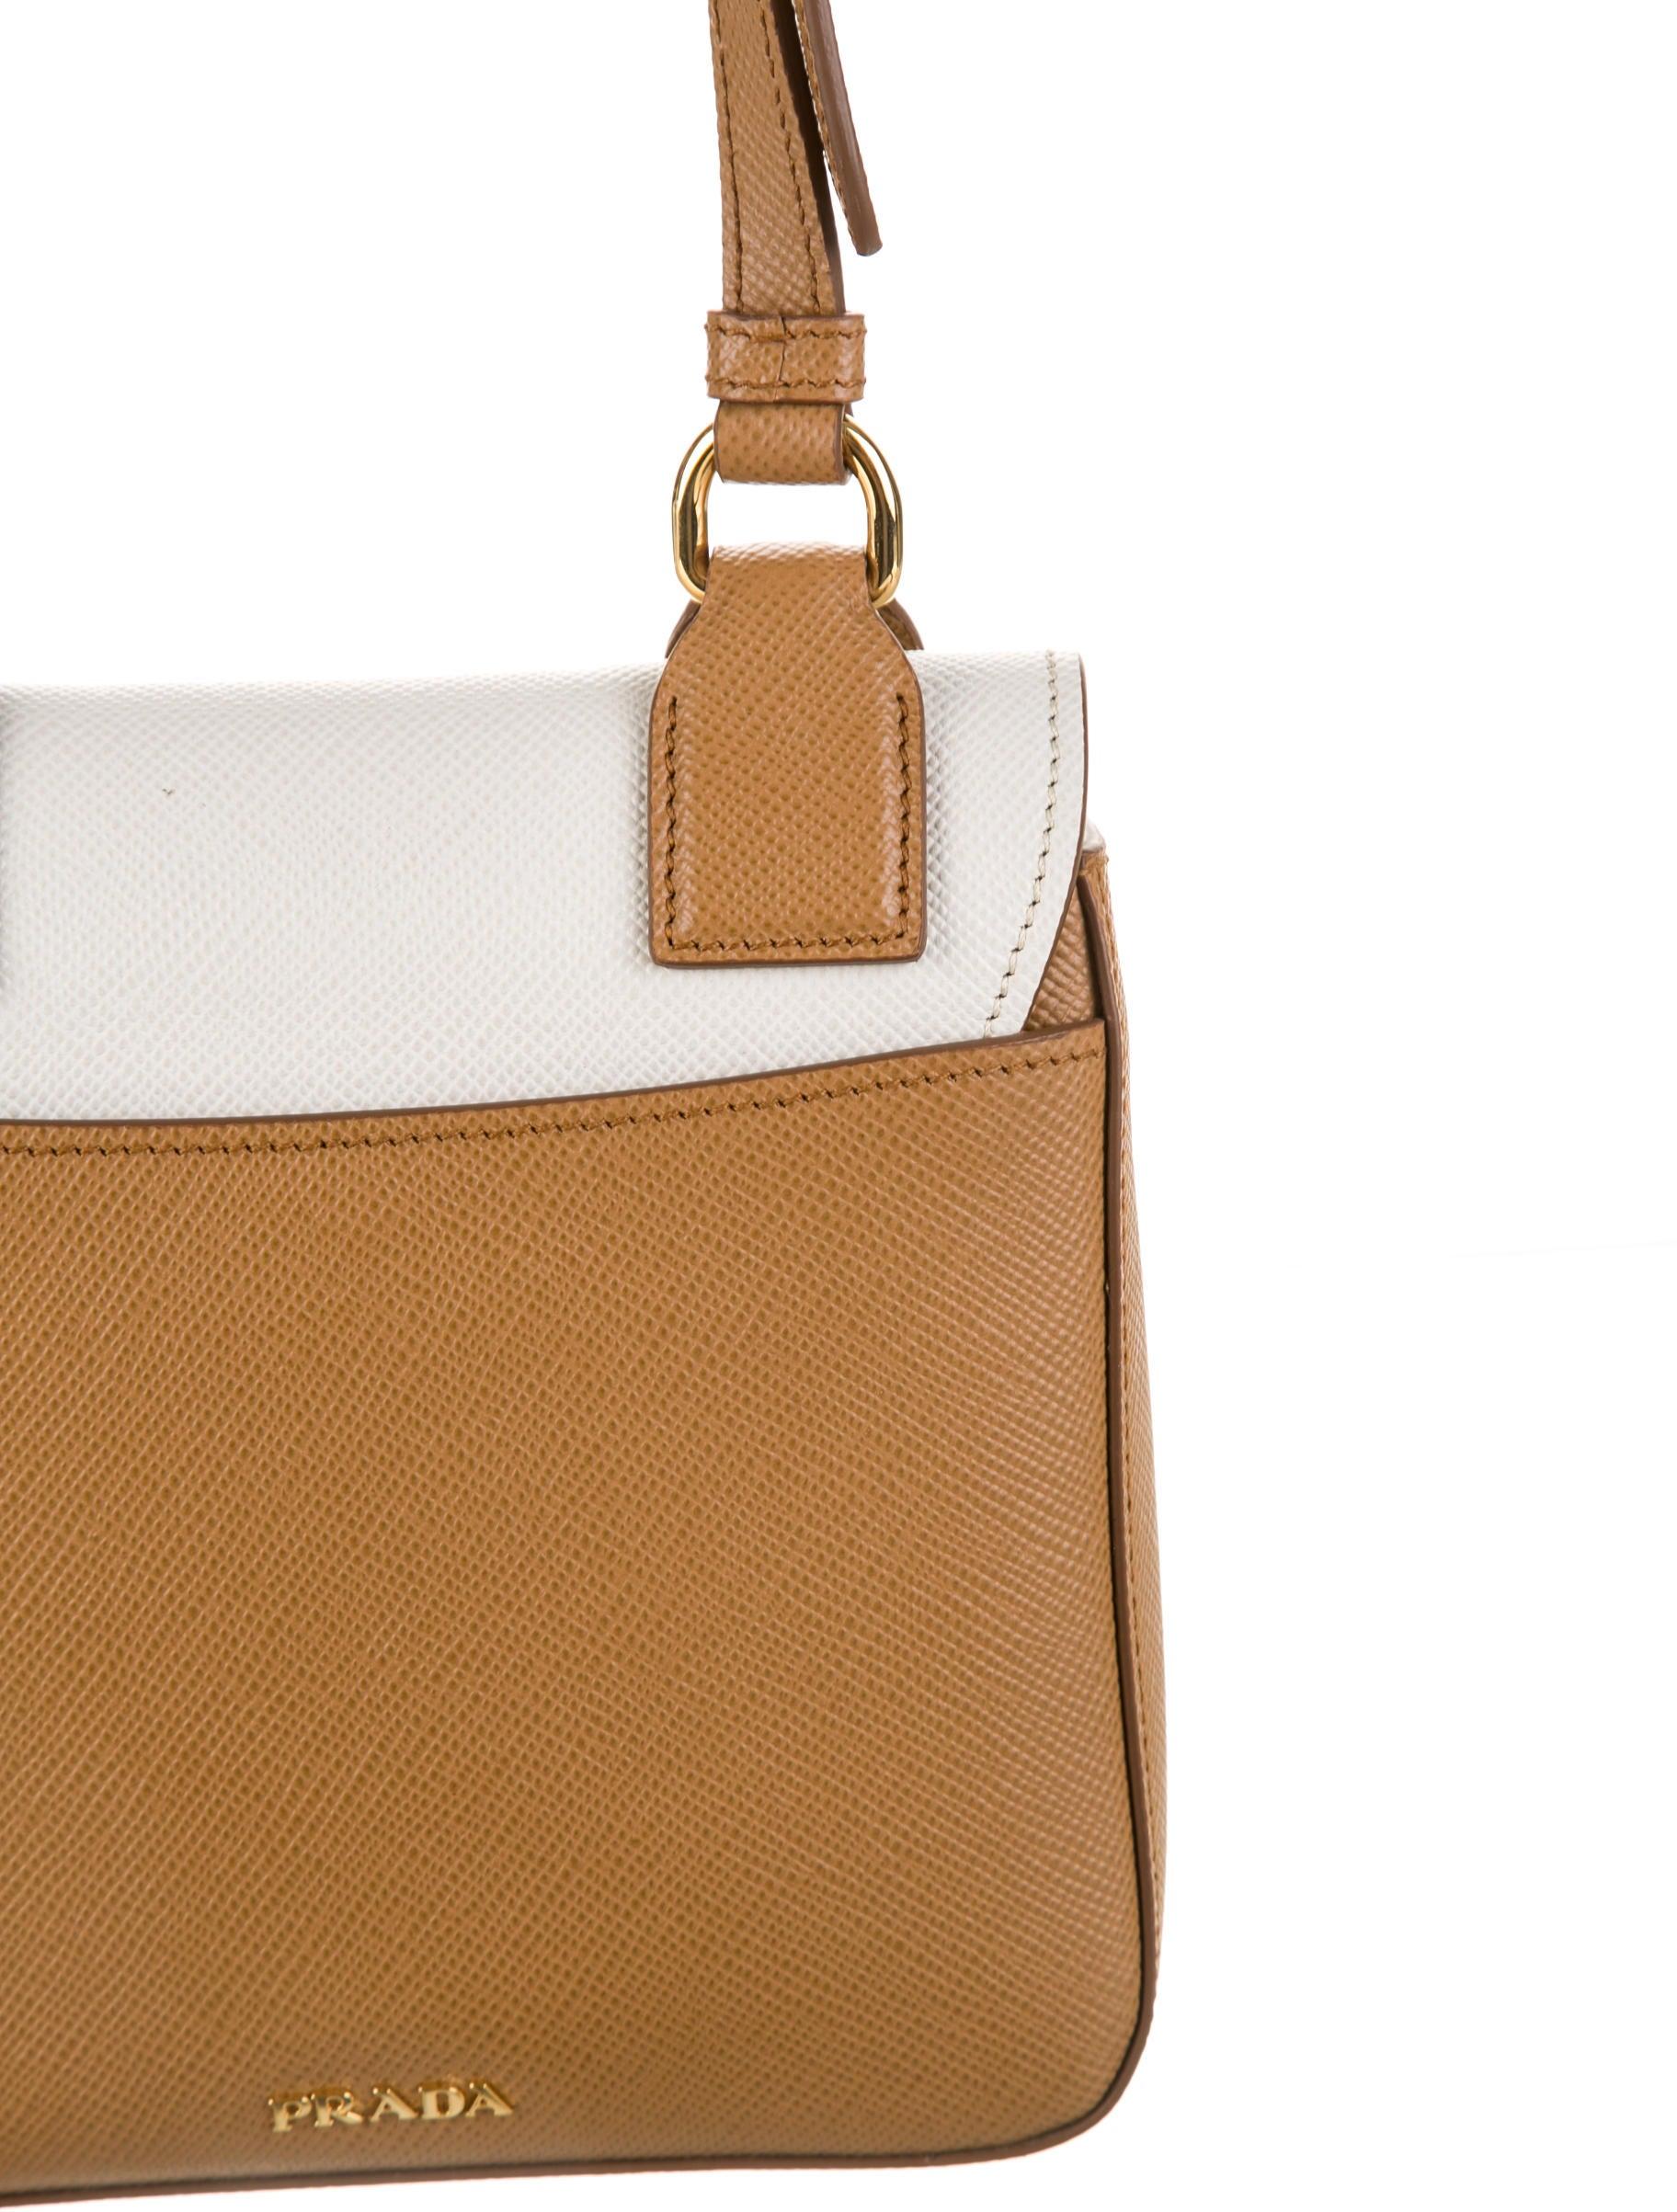 4104f083ae9f2f ... discount code for prada nylon handbags sale prada saffiano cuir  crossbody handbags pra59749 the realreal 5bba1 ...